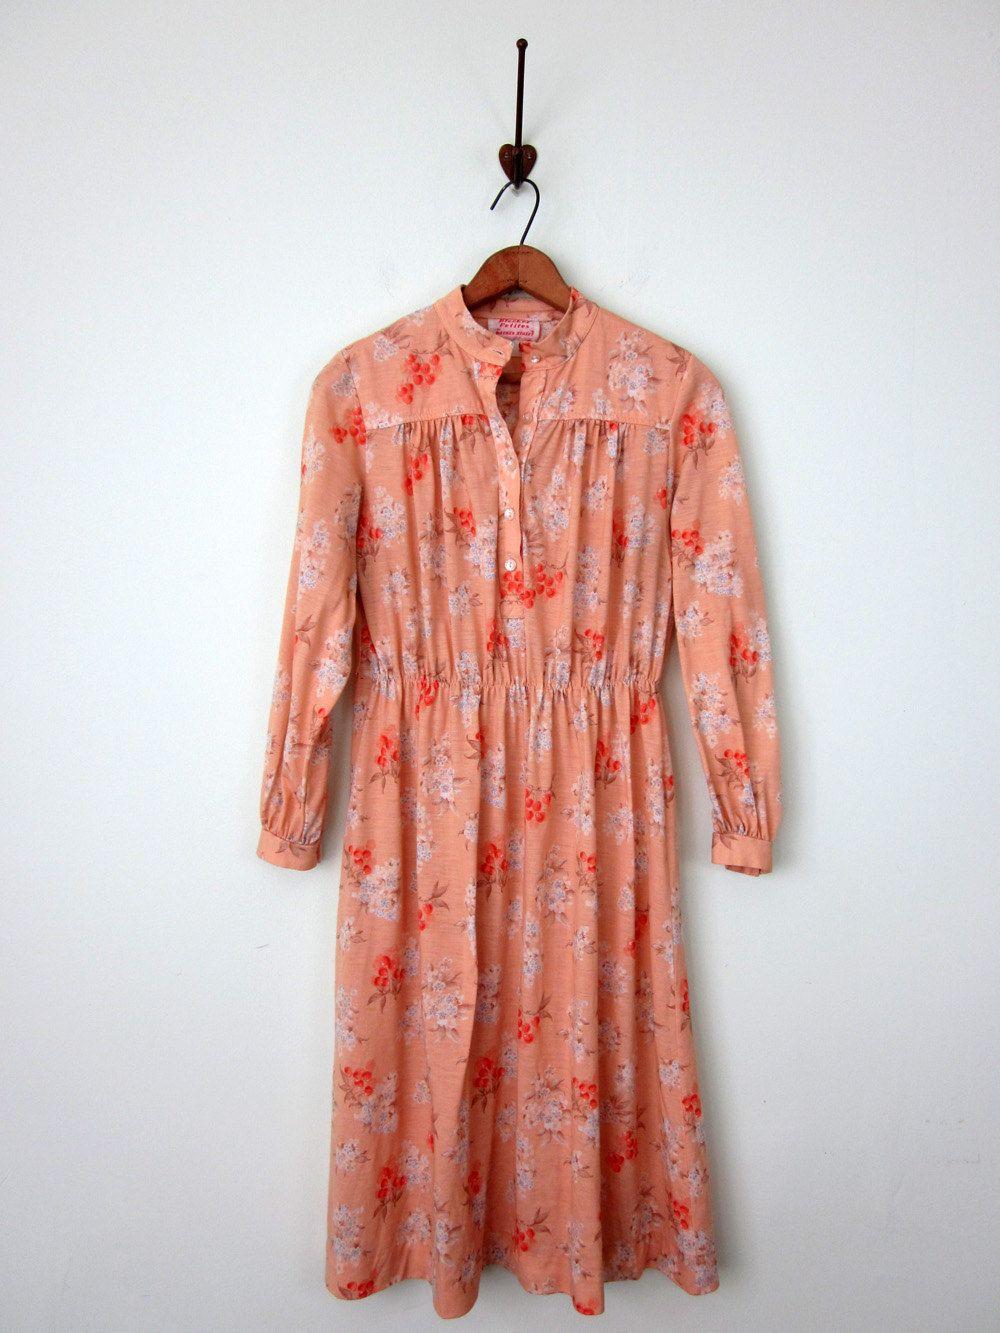 70s dress - add a belt